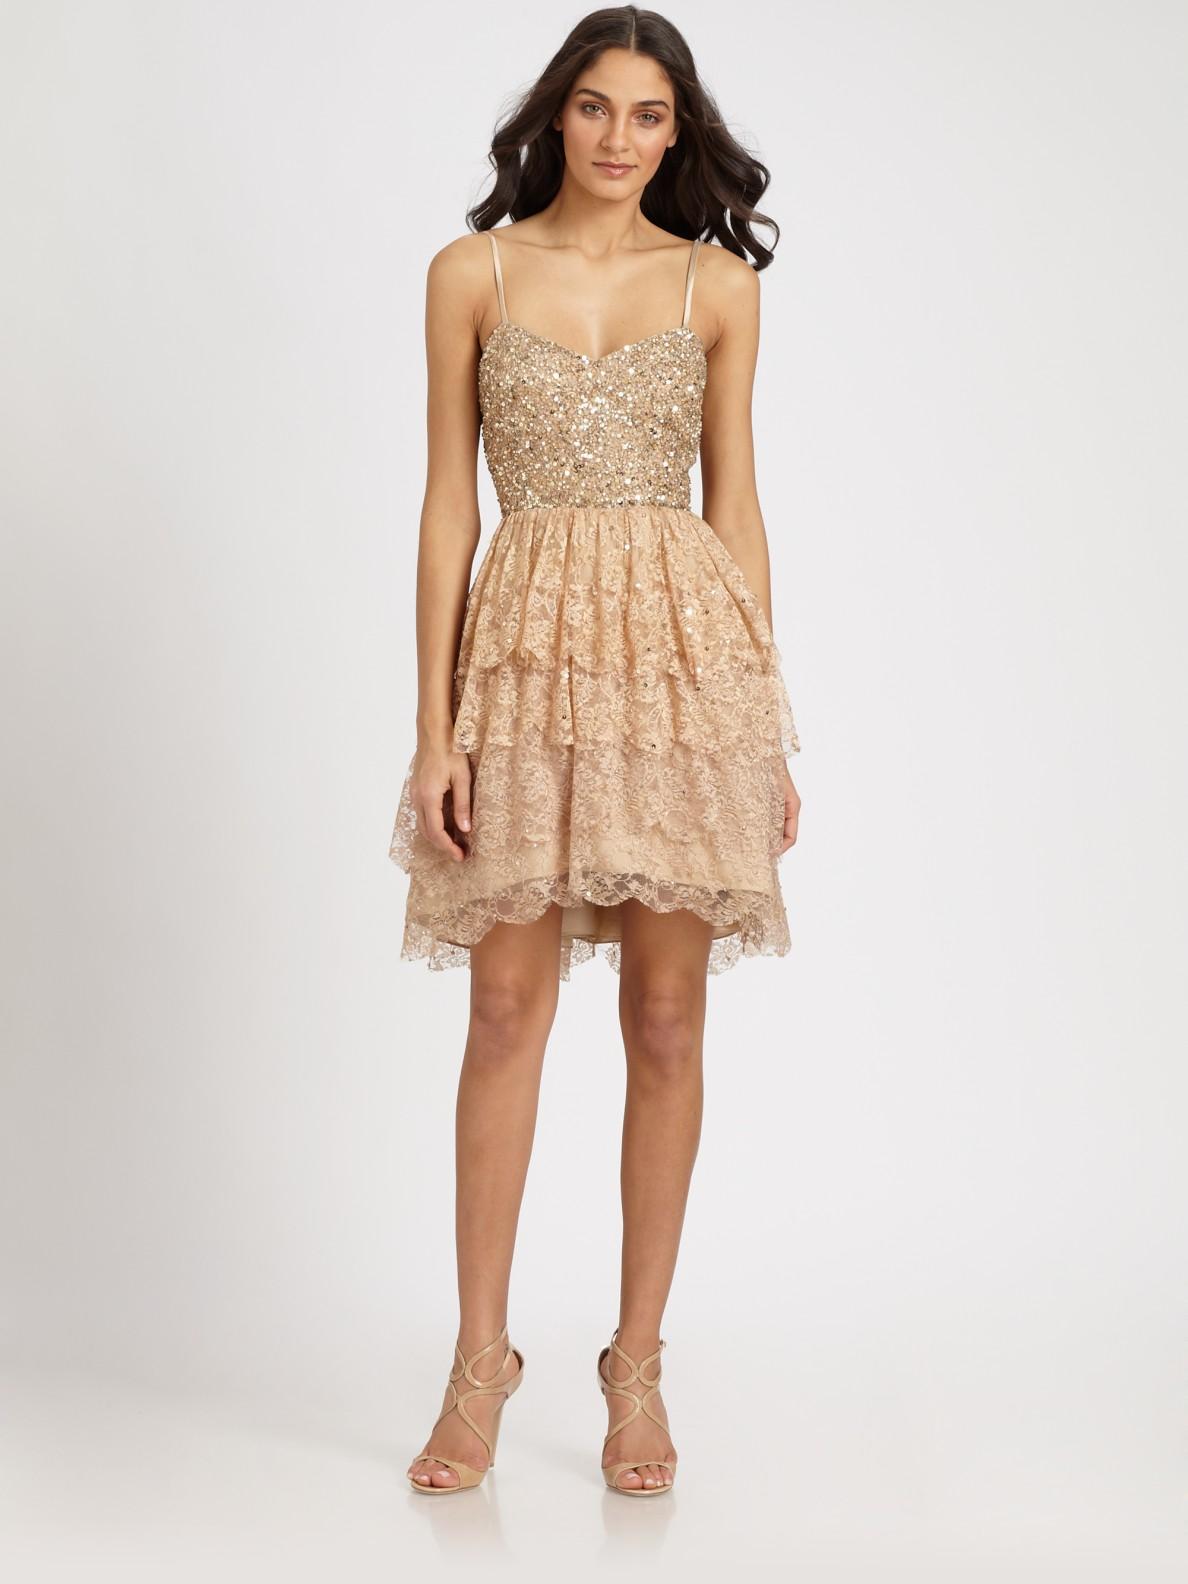 Lyst - Aidan Mattox Sequined Lace Dress in Metallic